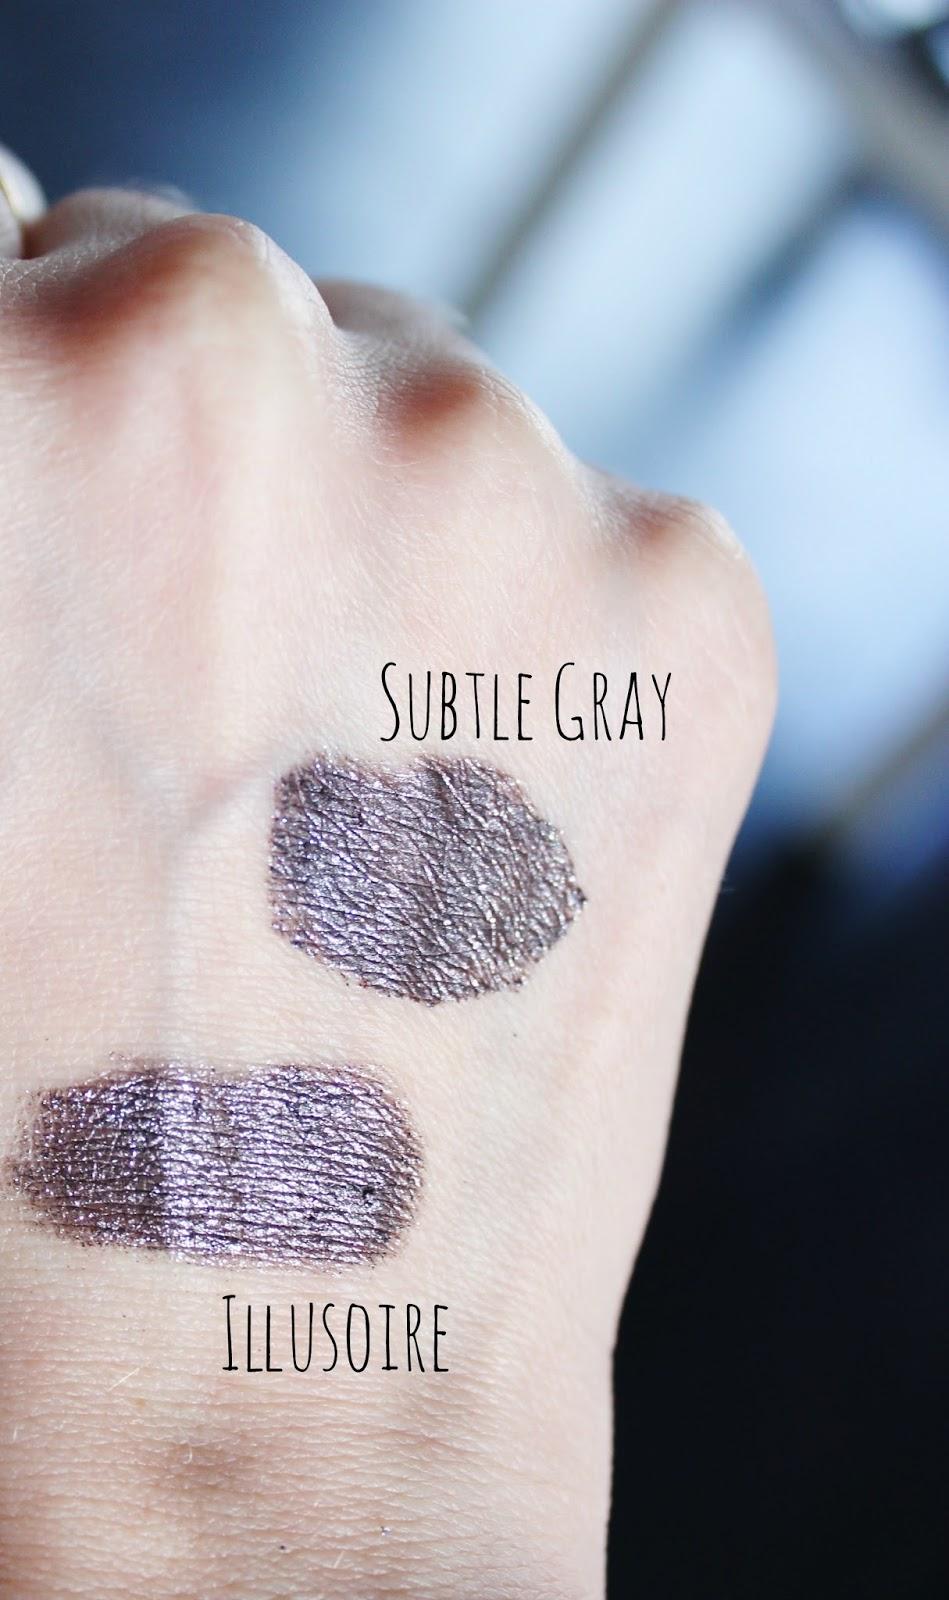 ombres crème illusoire chanel subtle gray sephora